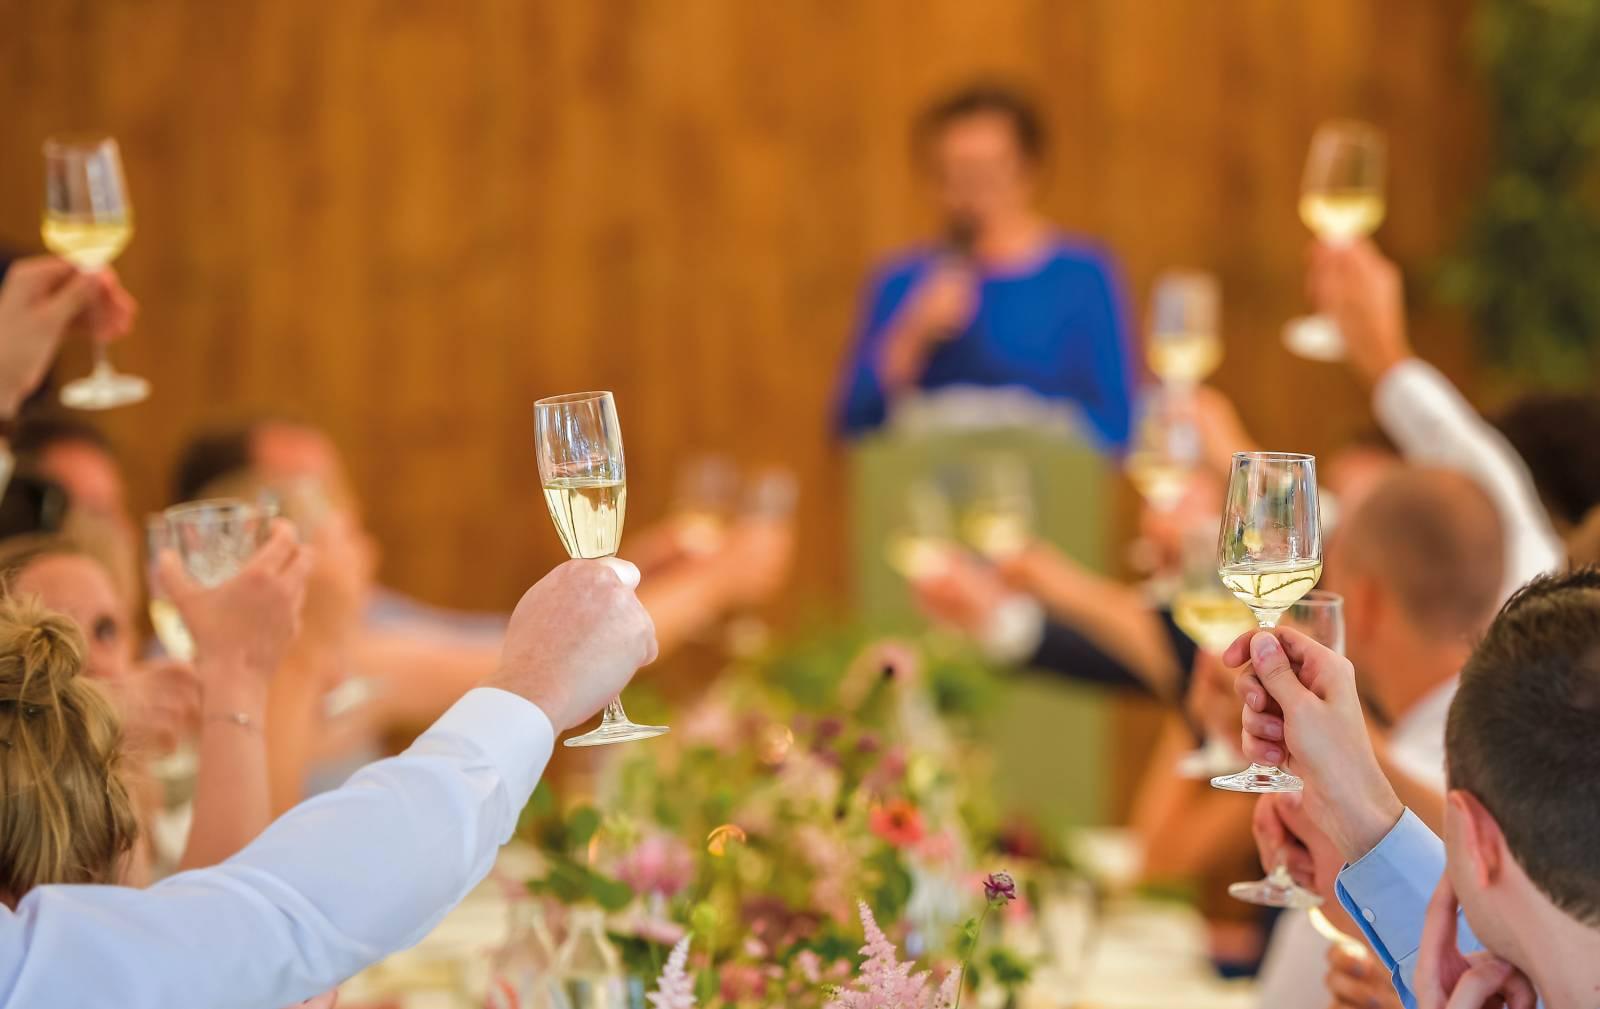 Silverspoon - Traiteur - Catering - Fotograaf MARTIN STEENHAUT - House of Weddings_06